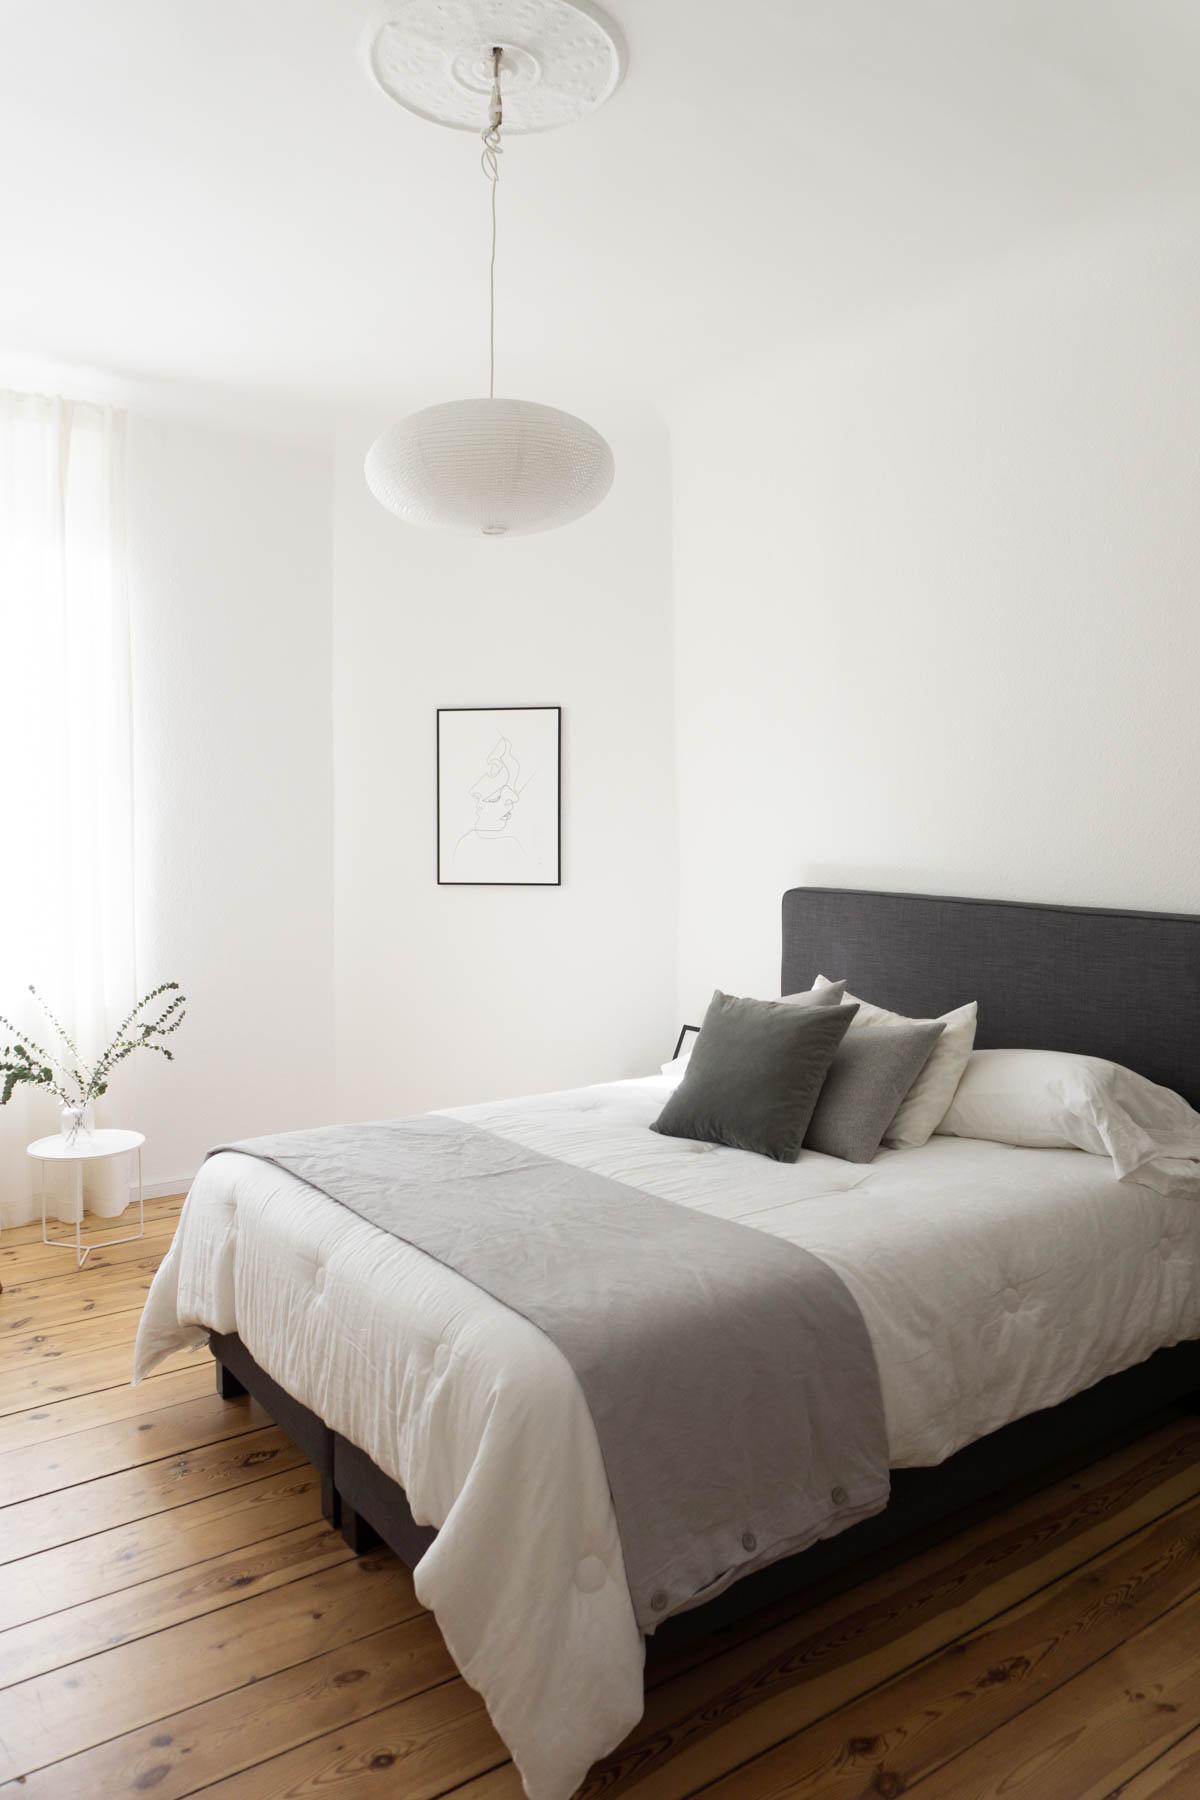 Rattan Cane Wood Chair Minimalist Bedroom Scandinavian Interior Design Eucalyptus Rebecca Goddard 15 Rg Daily